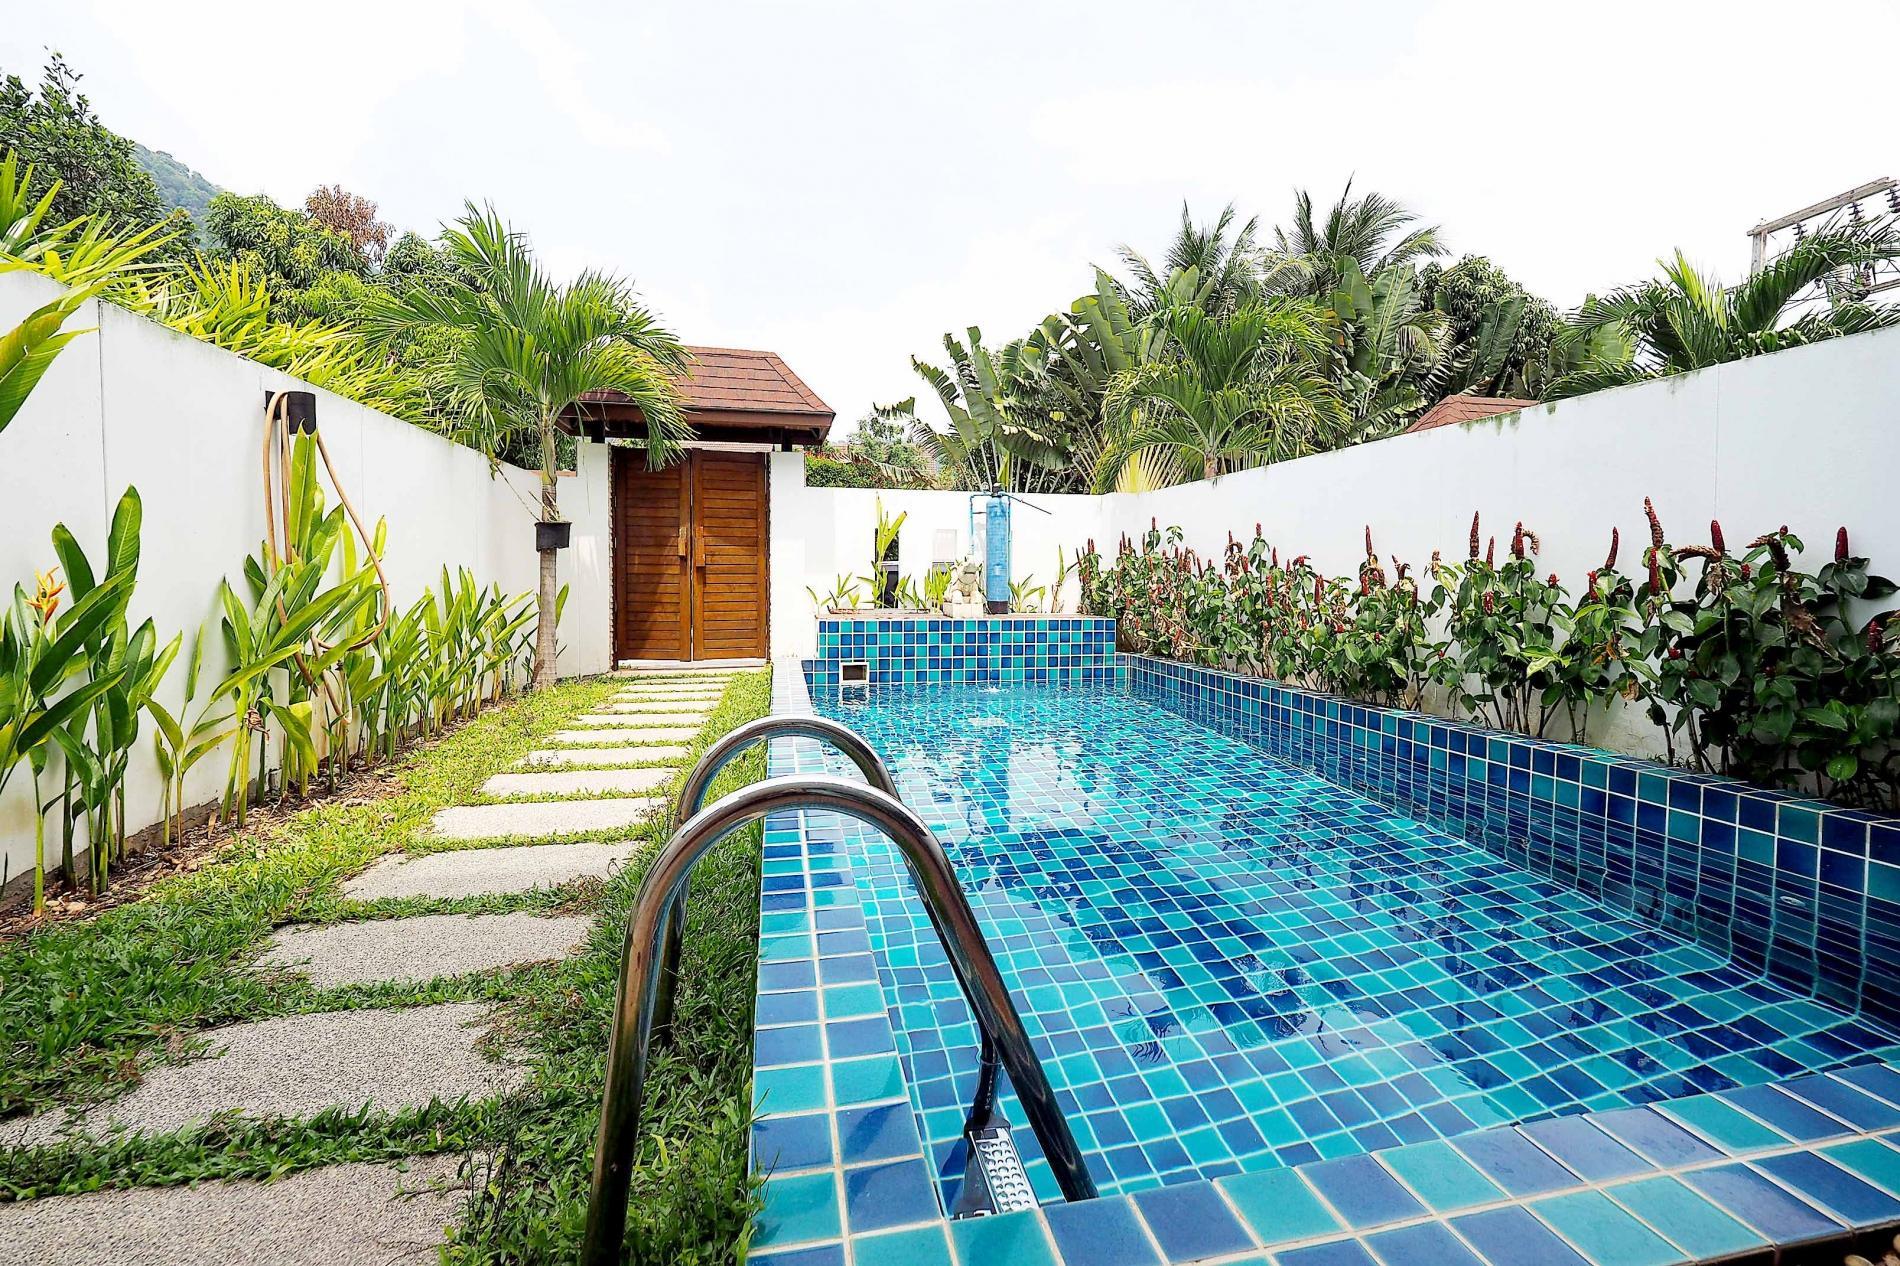 AP West 6 - Affordable pool villa in Kamala photo 15812714